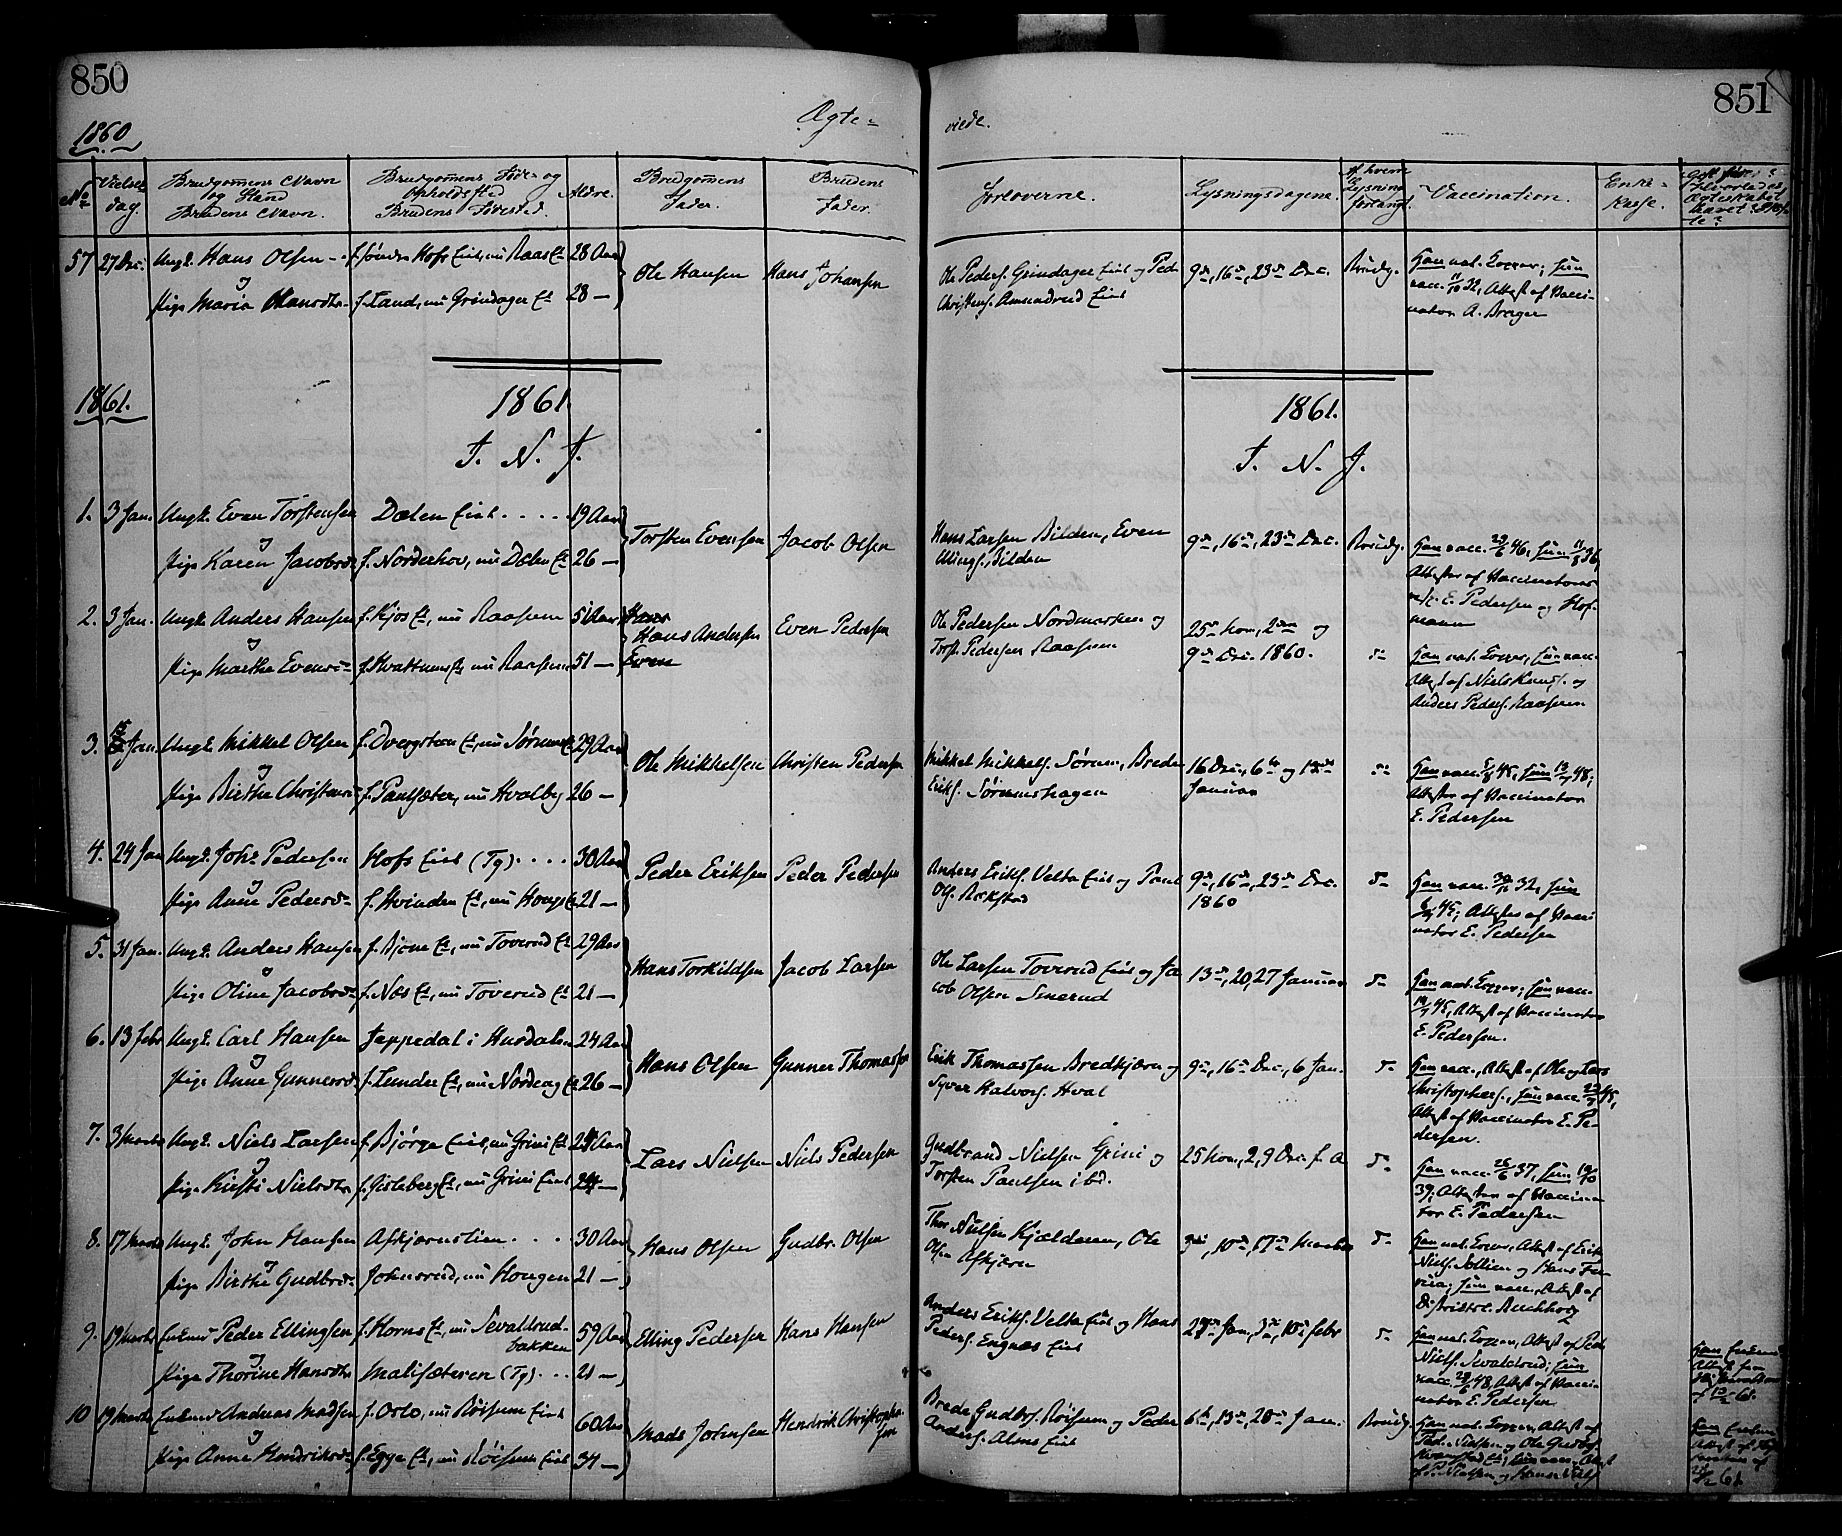 SAH, Gran prestekontor, Ministerialbok nr. 12, 1856-1874, s. 850-851